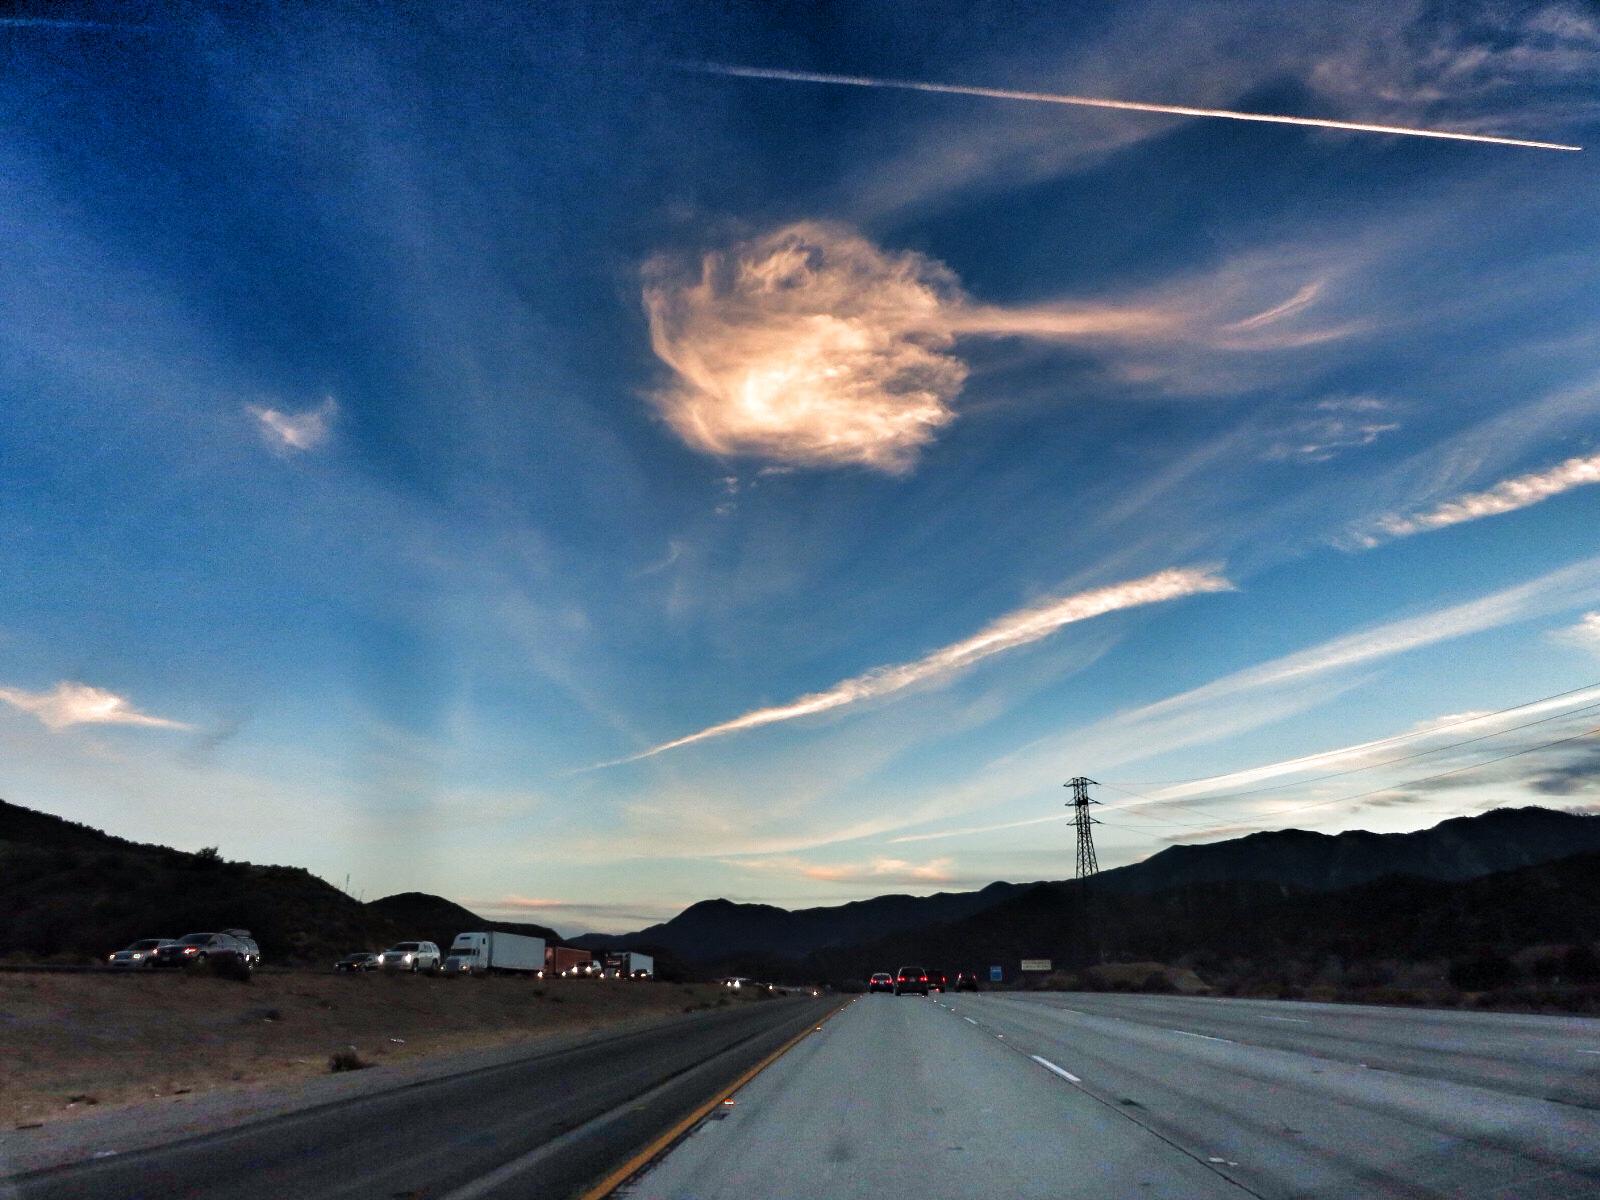 http://thedigitalstory.com/2013/12/28/cloud-over-tejon-pass.jpg